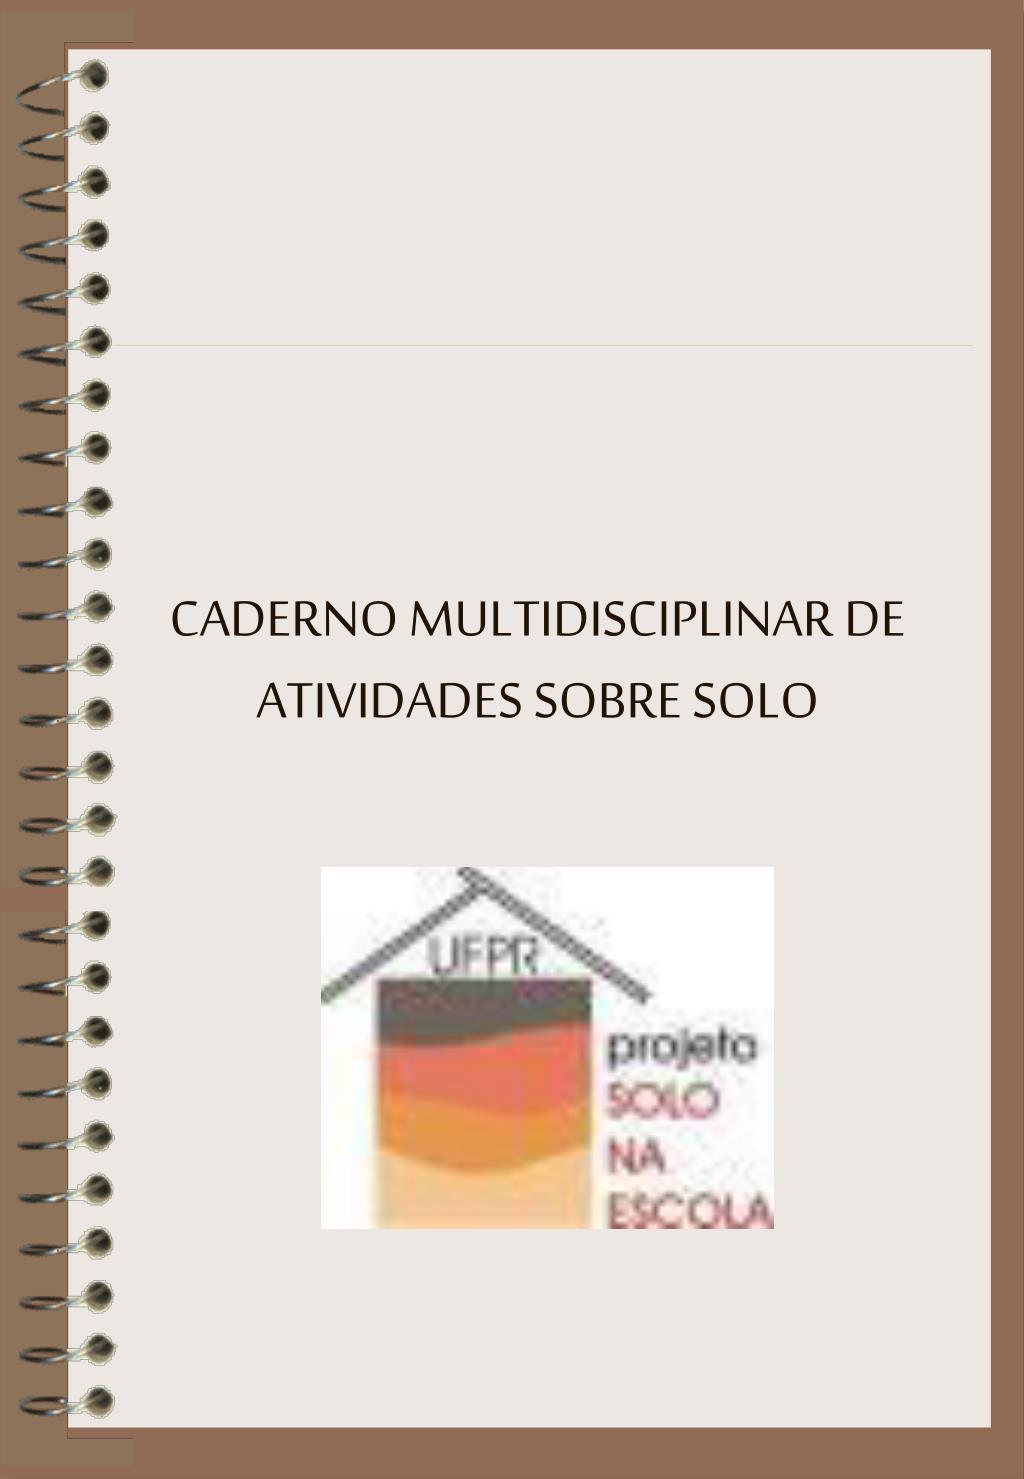 caderno multidisciplinar de atividades sobre solo l.